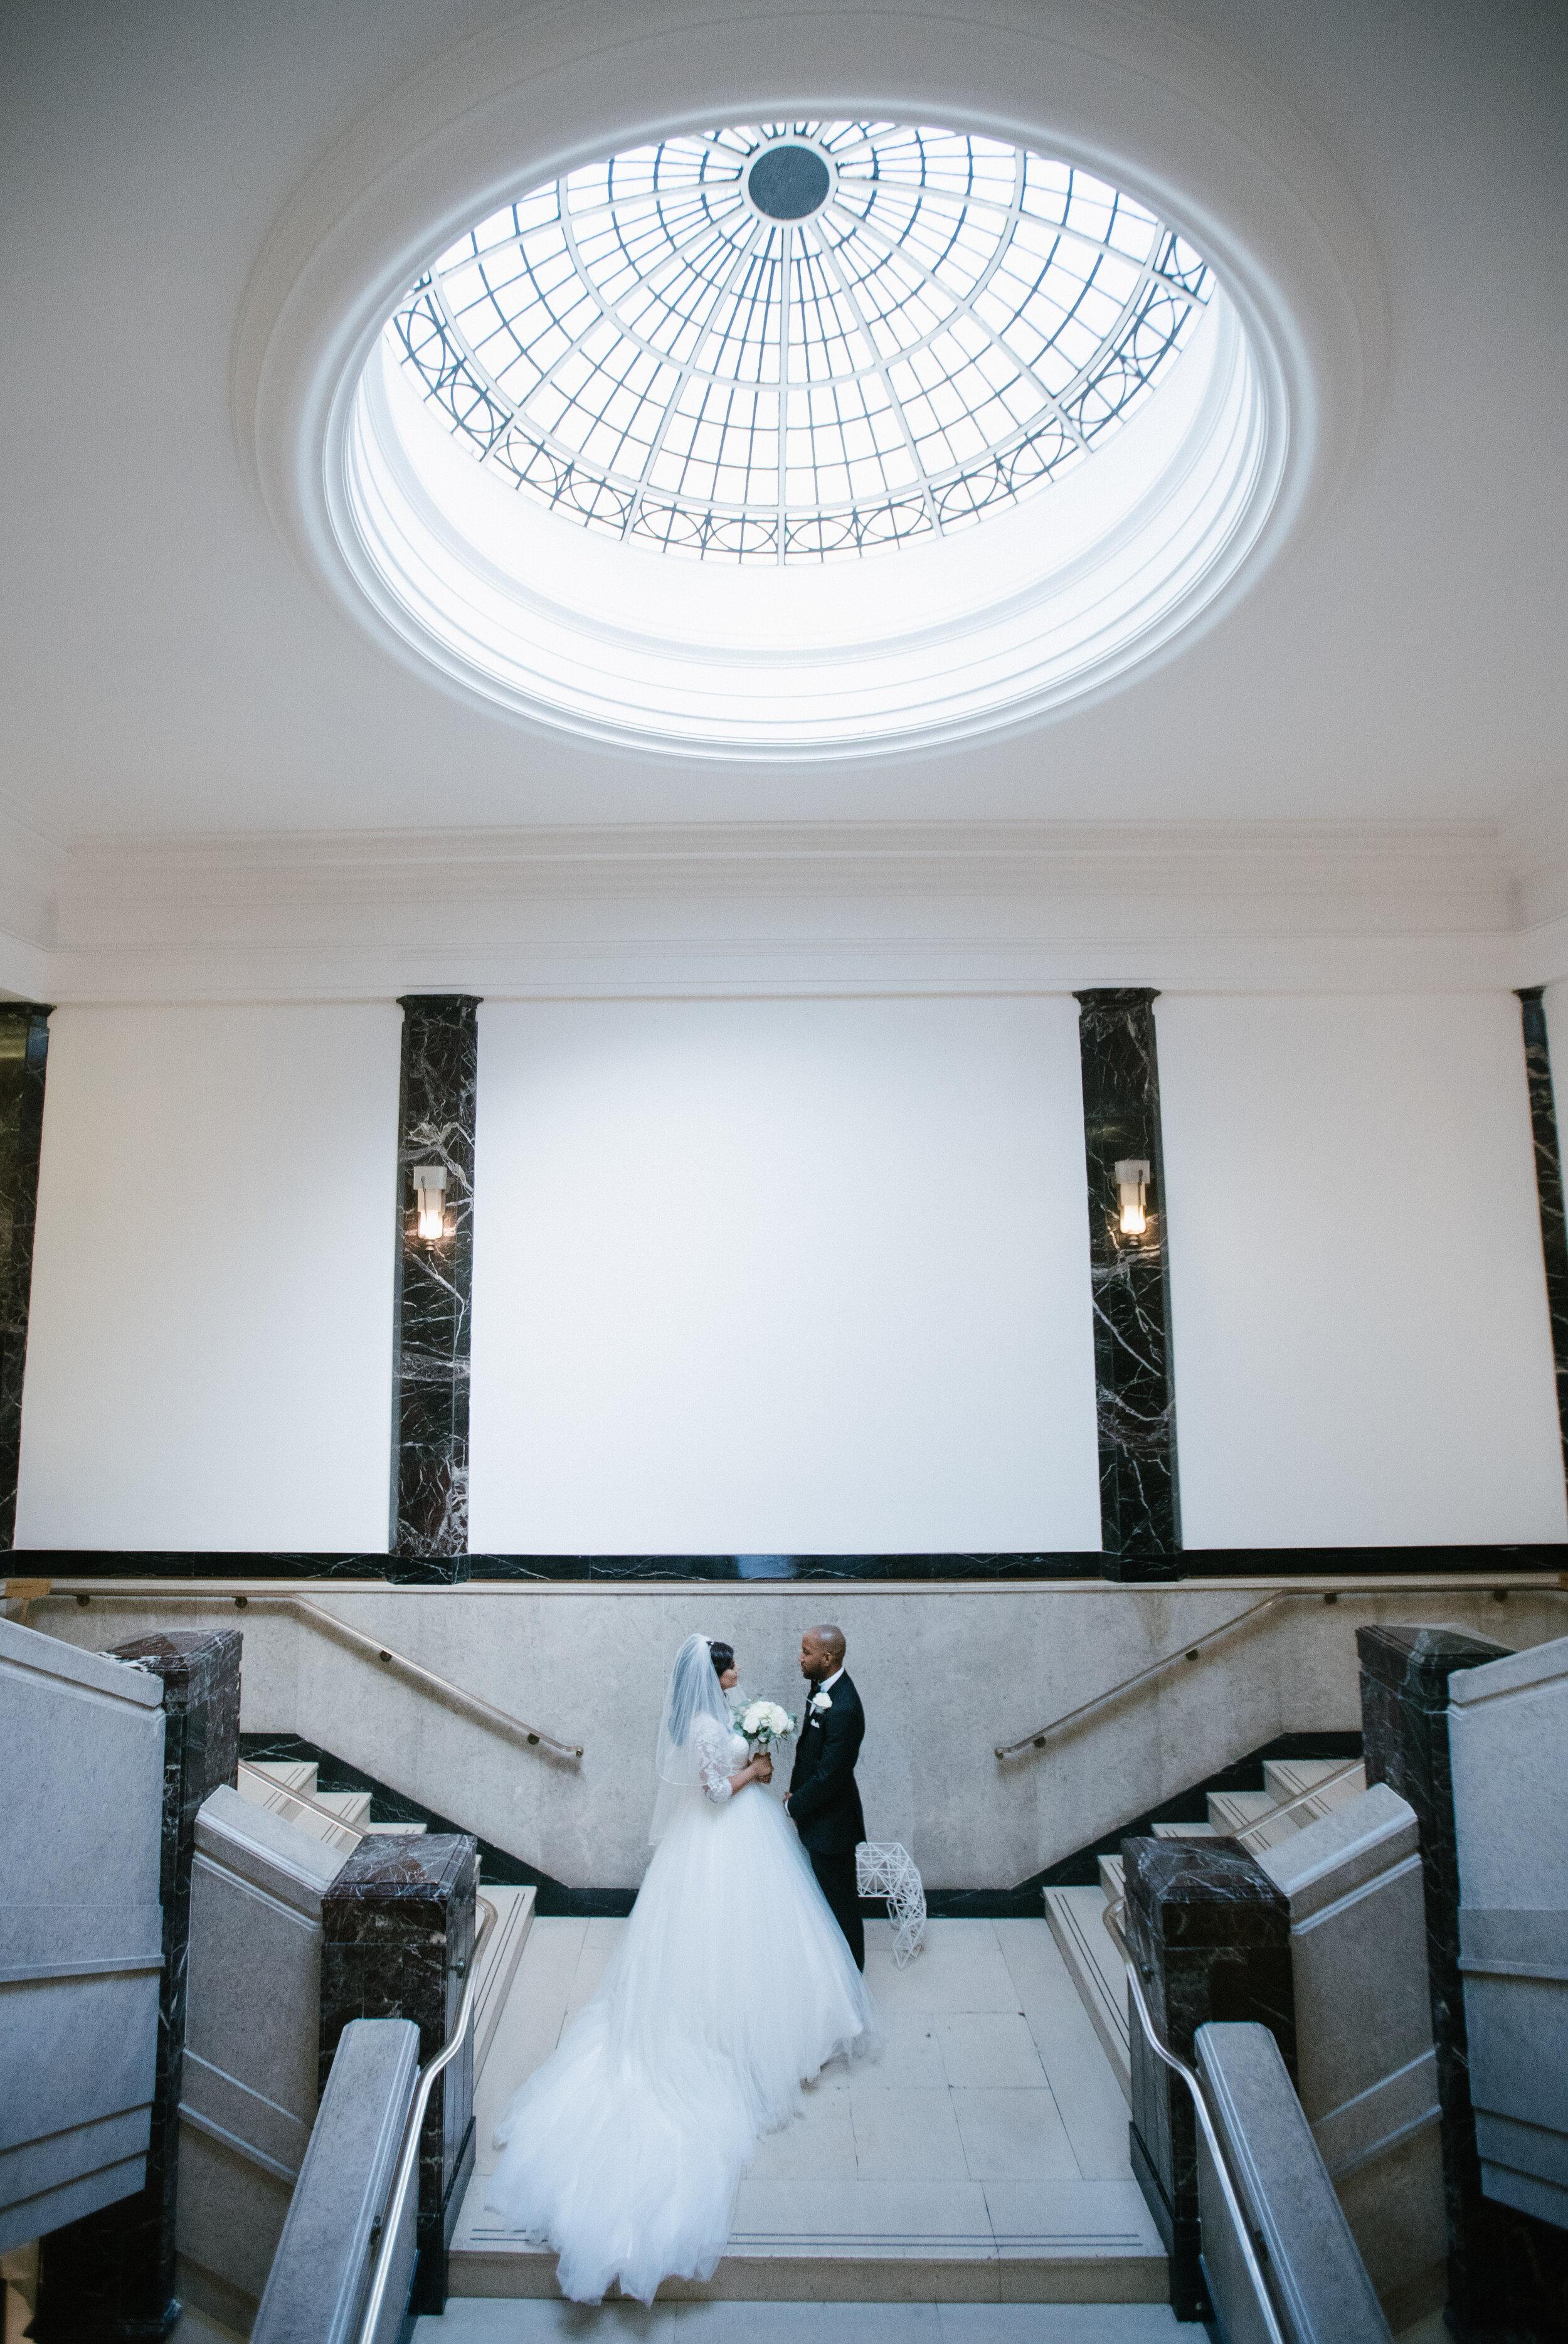 east-london-wedding-photographer-videographer-patriot-square-apartments-43